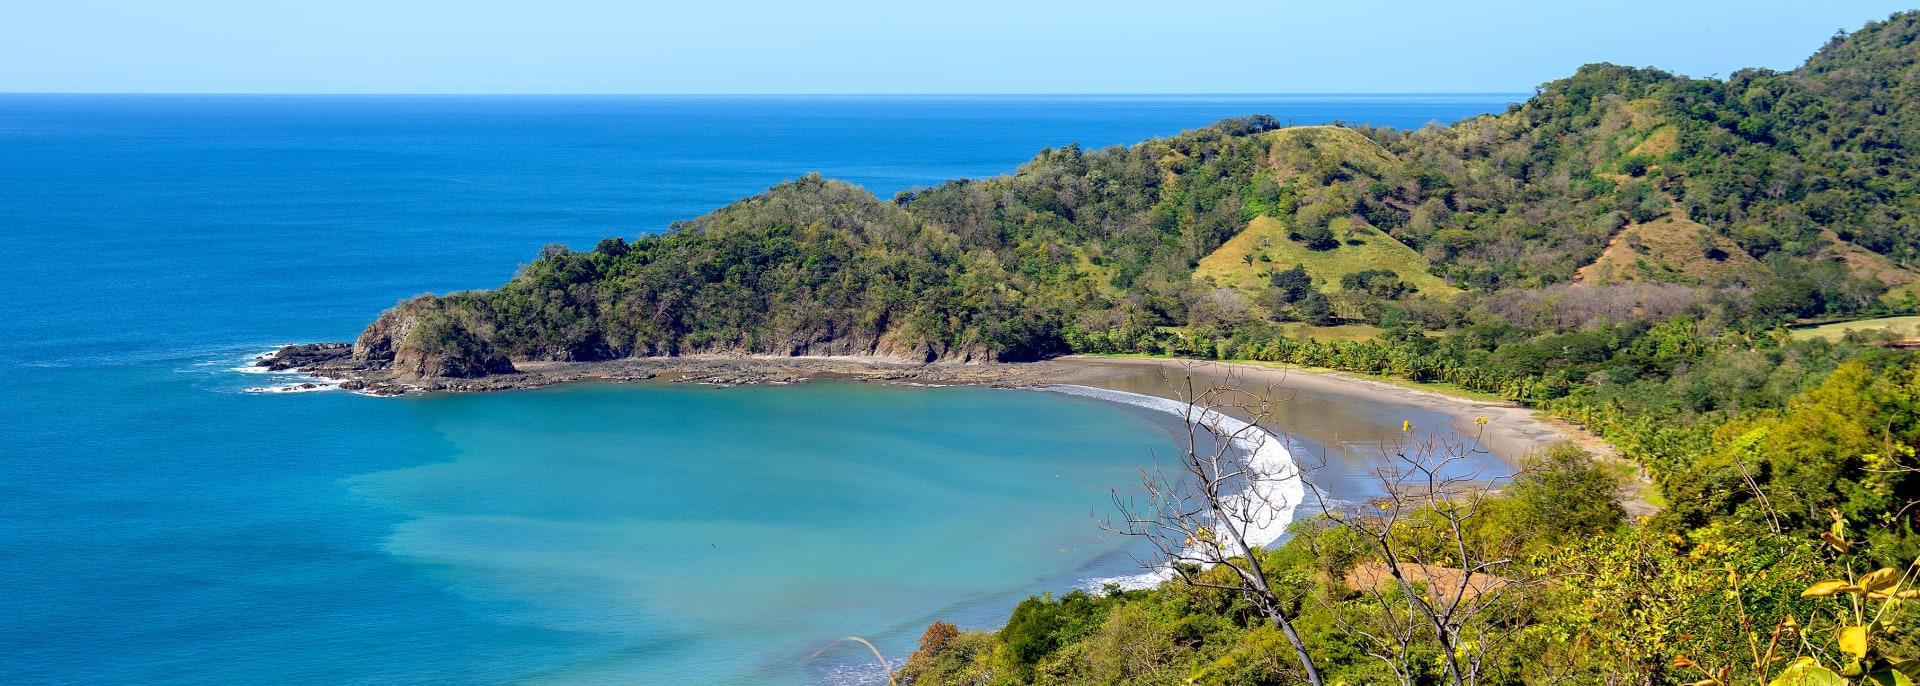 Playa Islita, Costa Rica